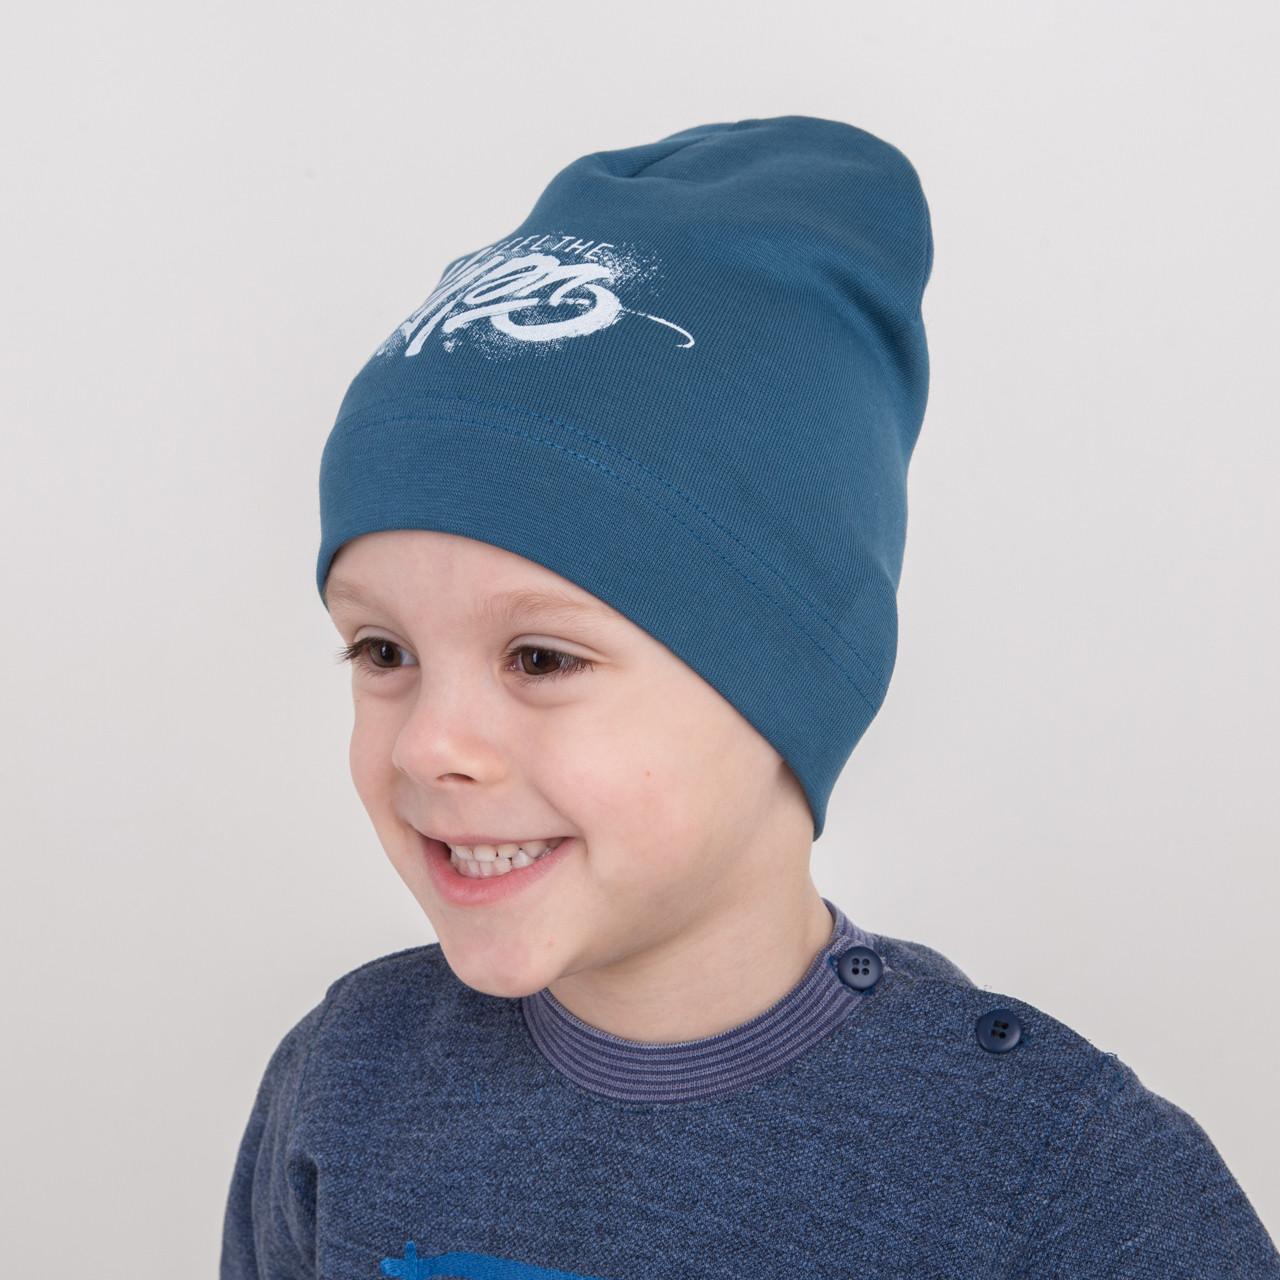 Весенняя хлопковая шапка на мальчика оптом 2018 - Hype  - Артикул 2177